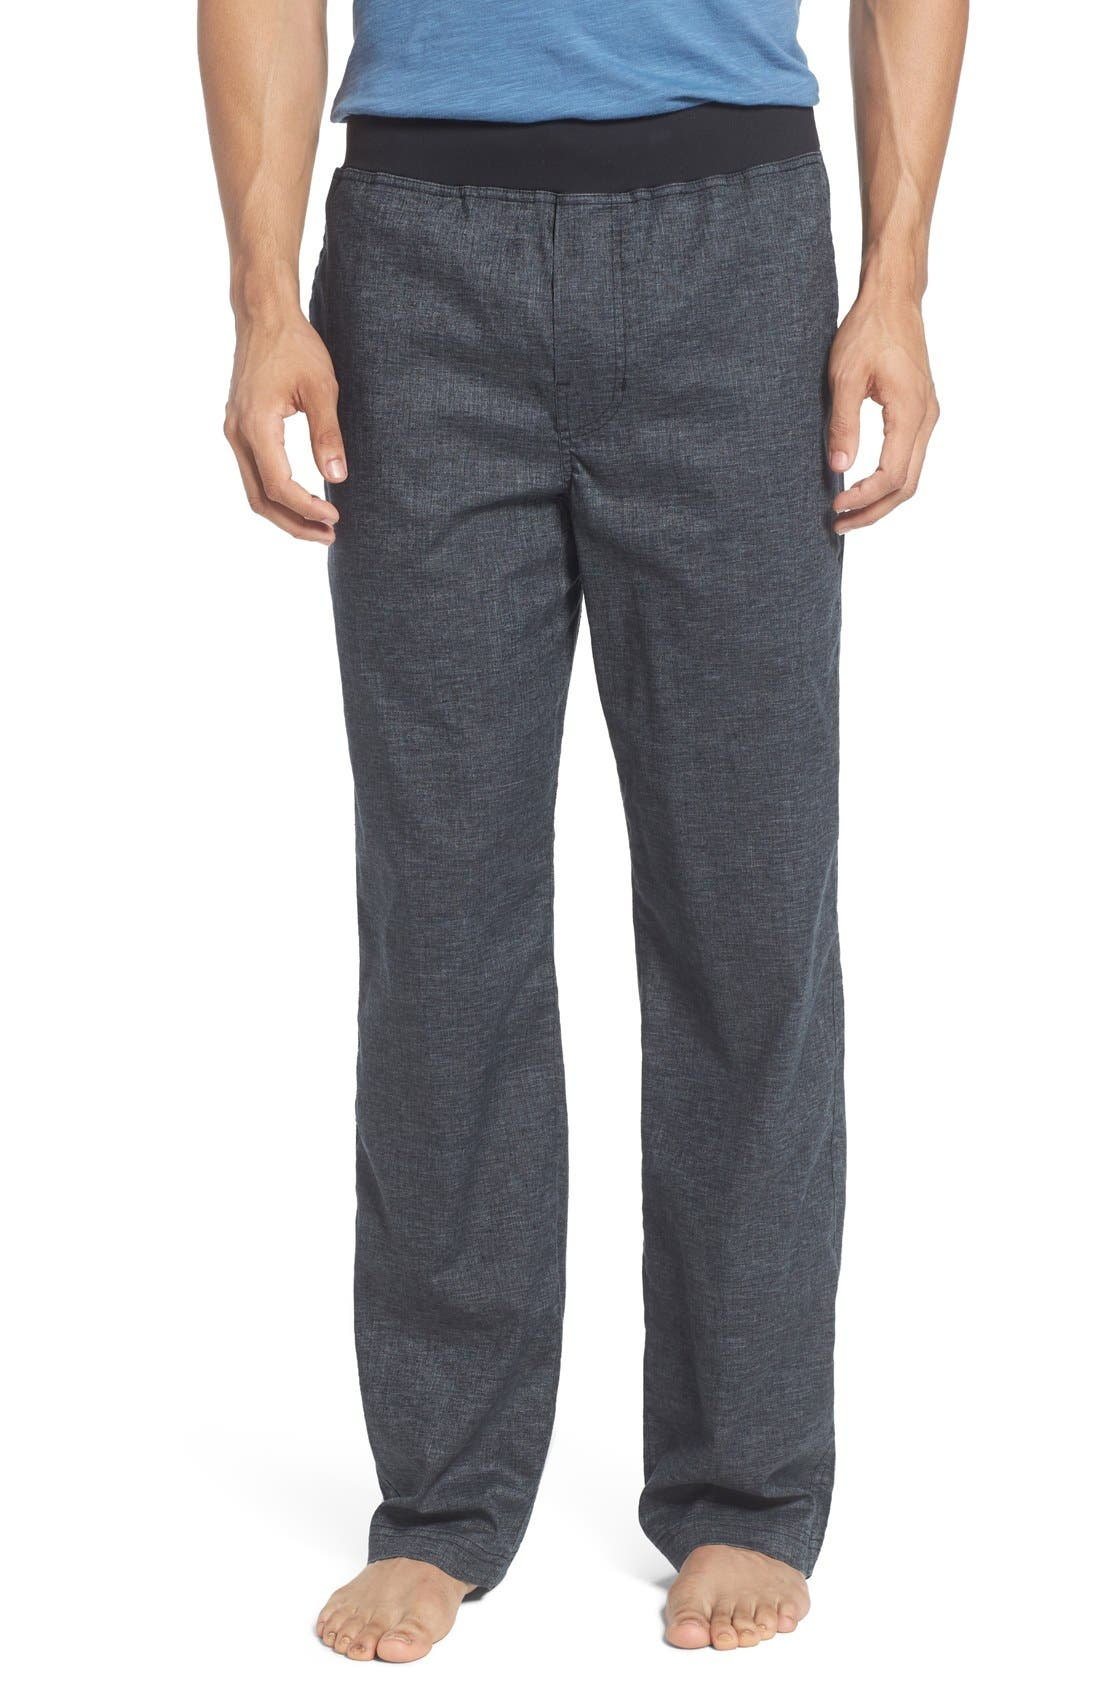 Alternate Image 1 Selected - prAna 'Vaha' Yoga Pants